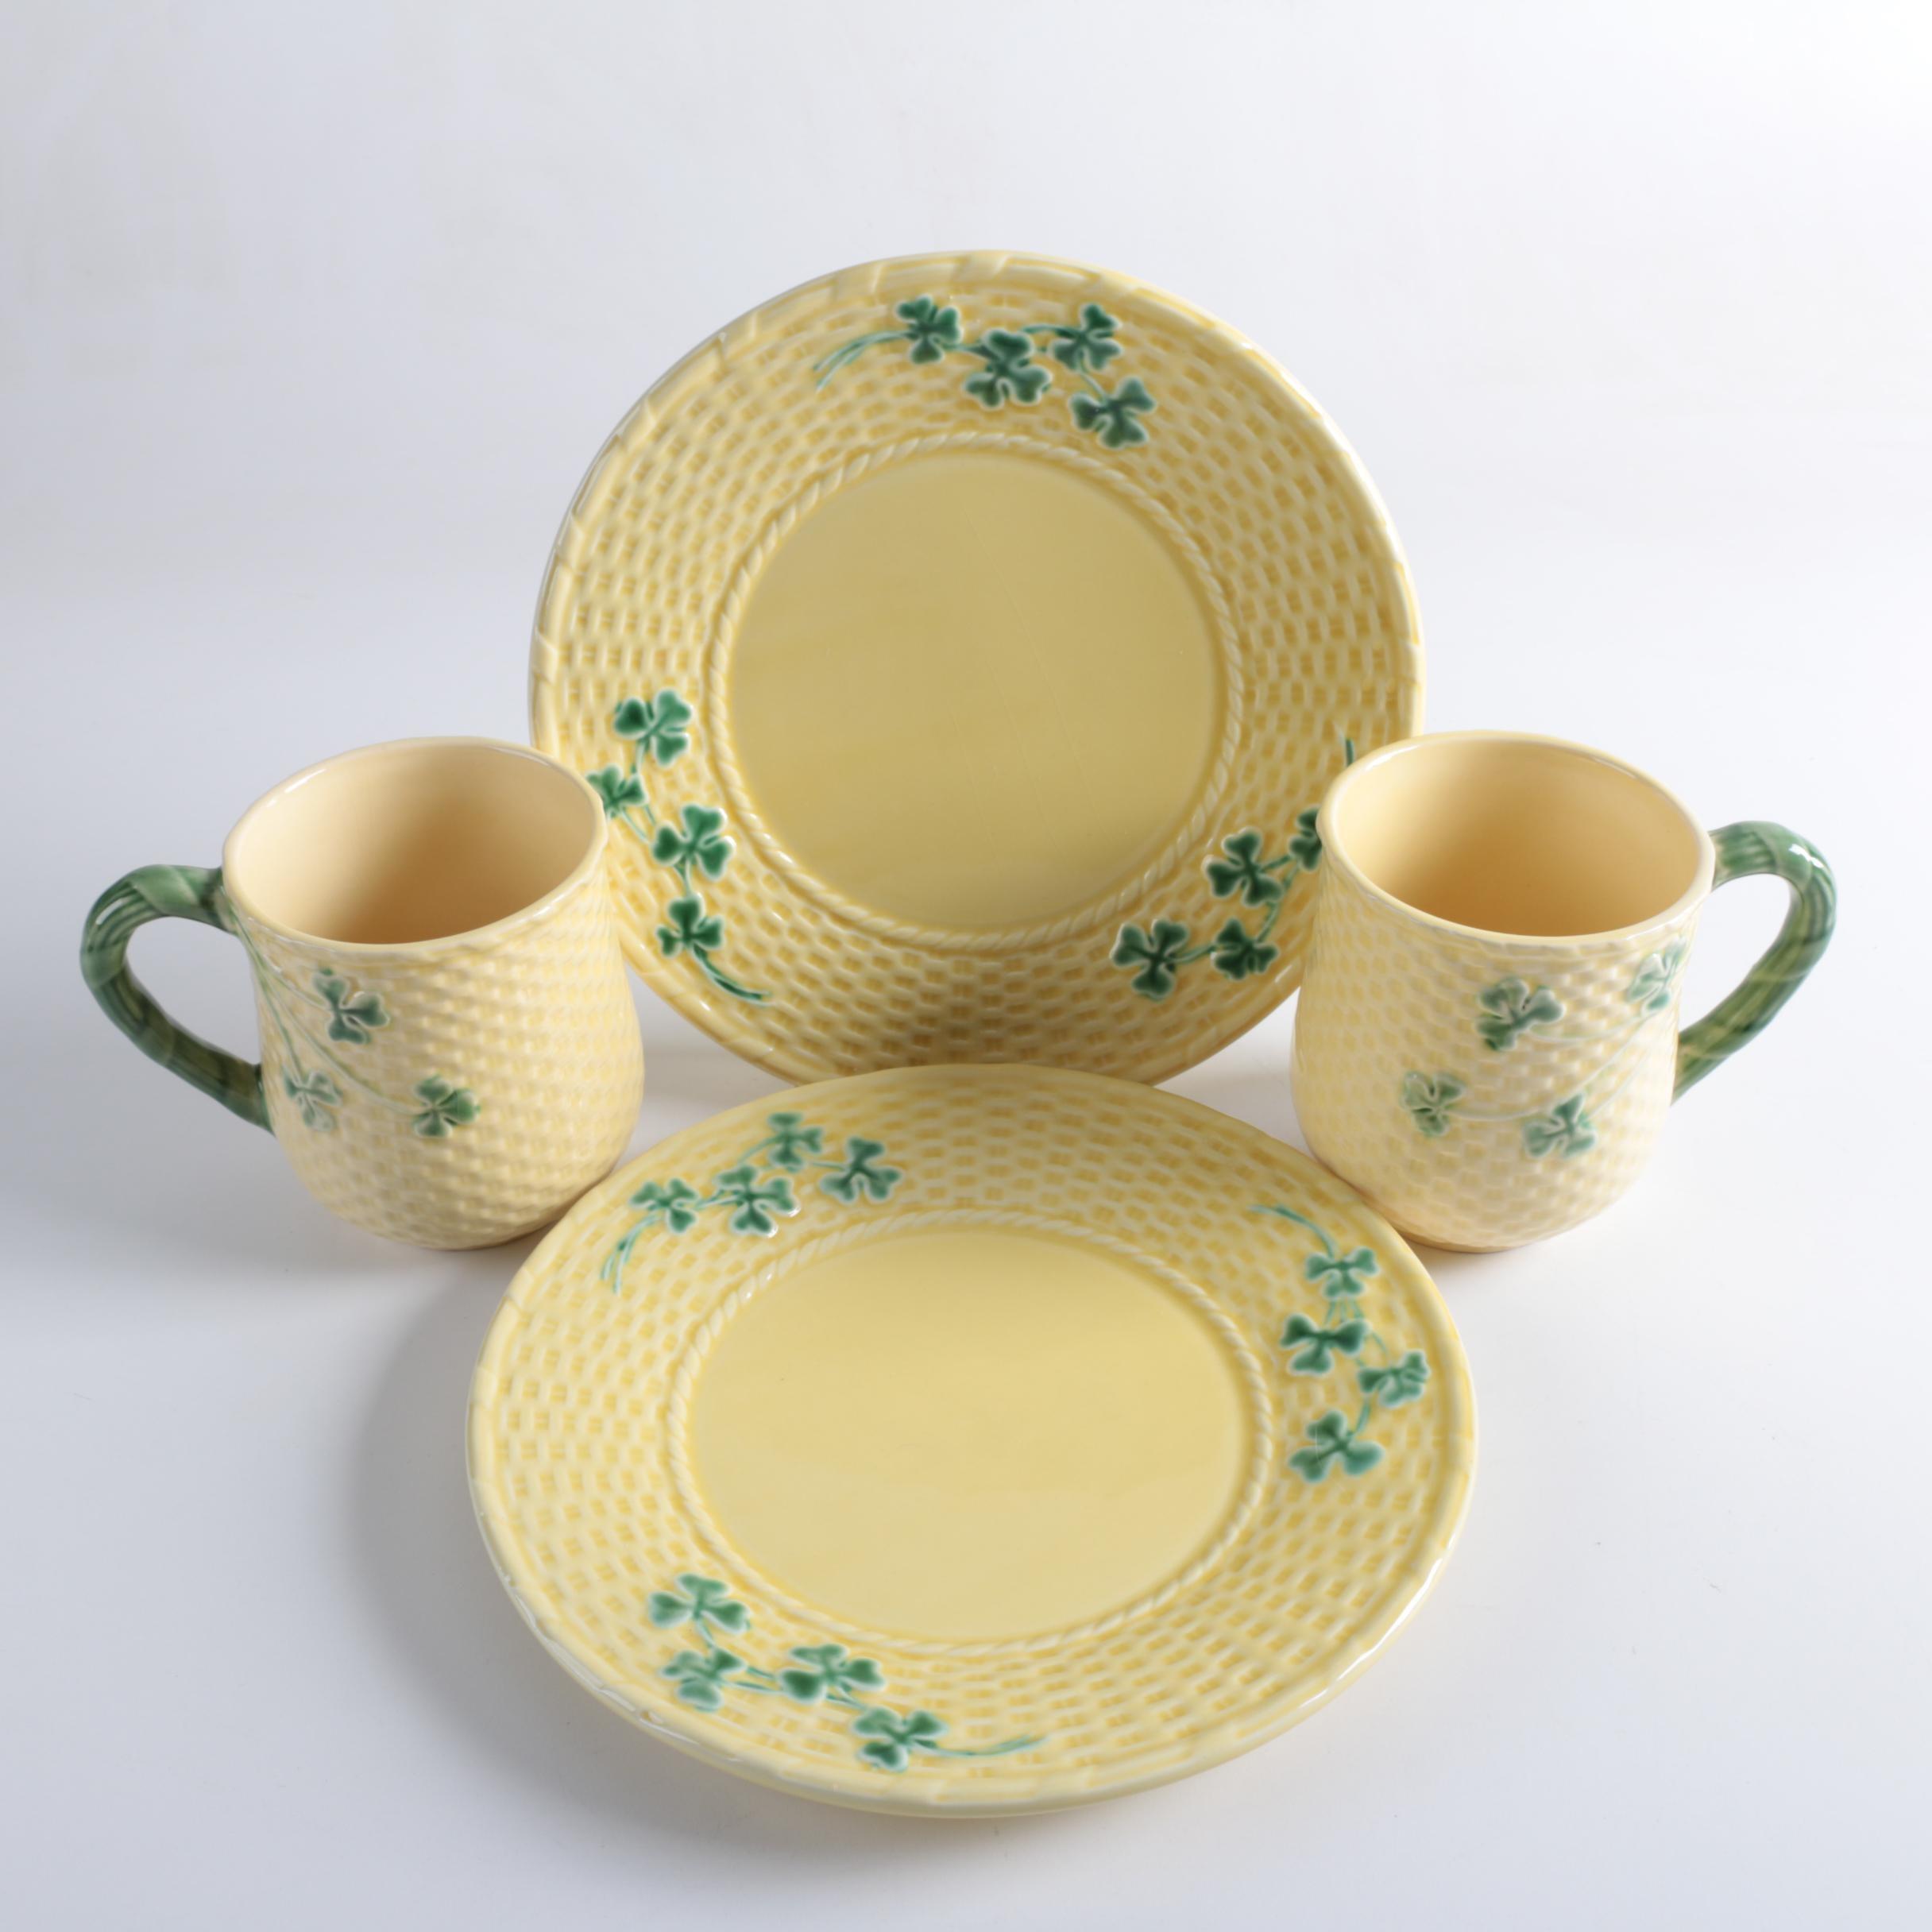 Portuguese Bordallo Pinheiro  Shamrock  Mugs and Plates ... & Portuguese Bordallo Pinheiro